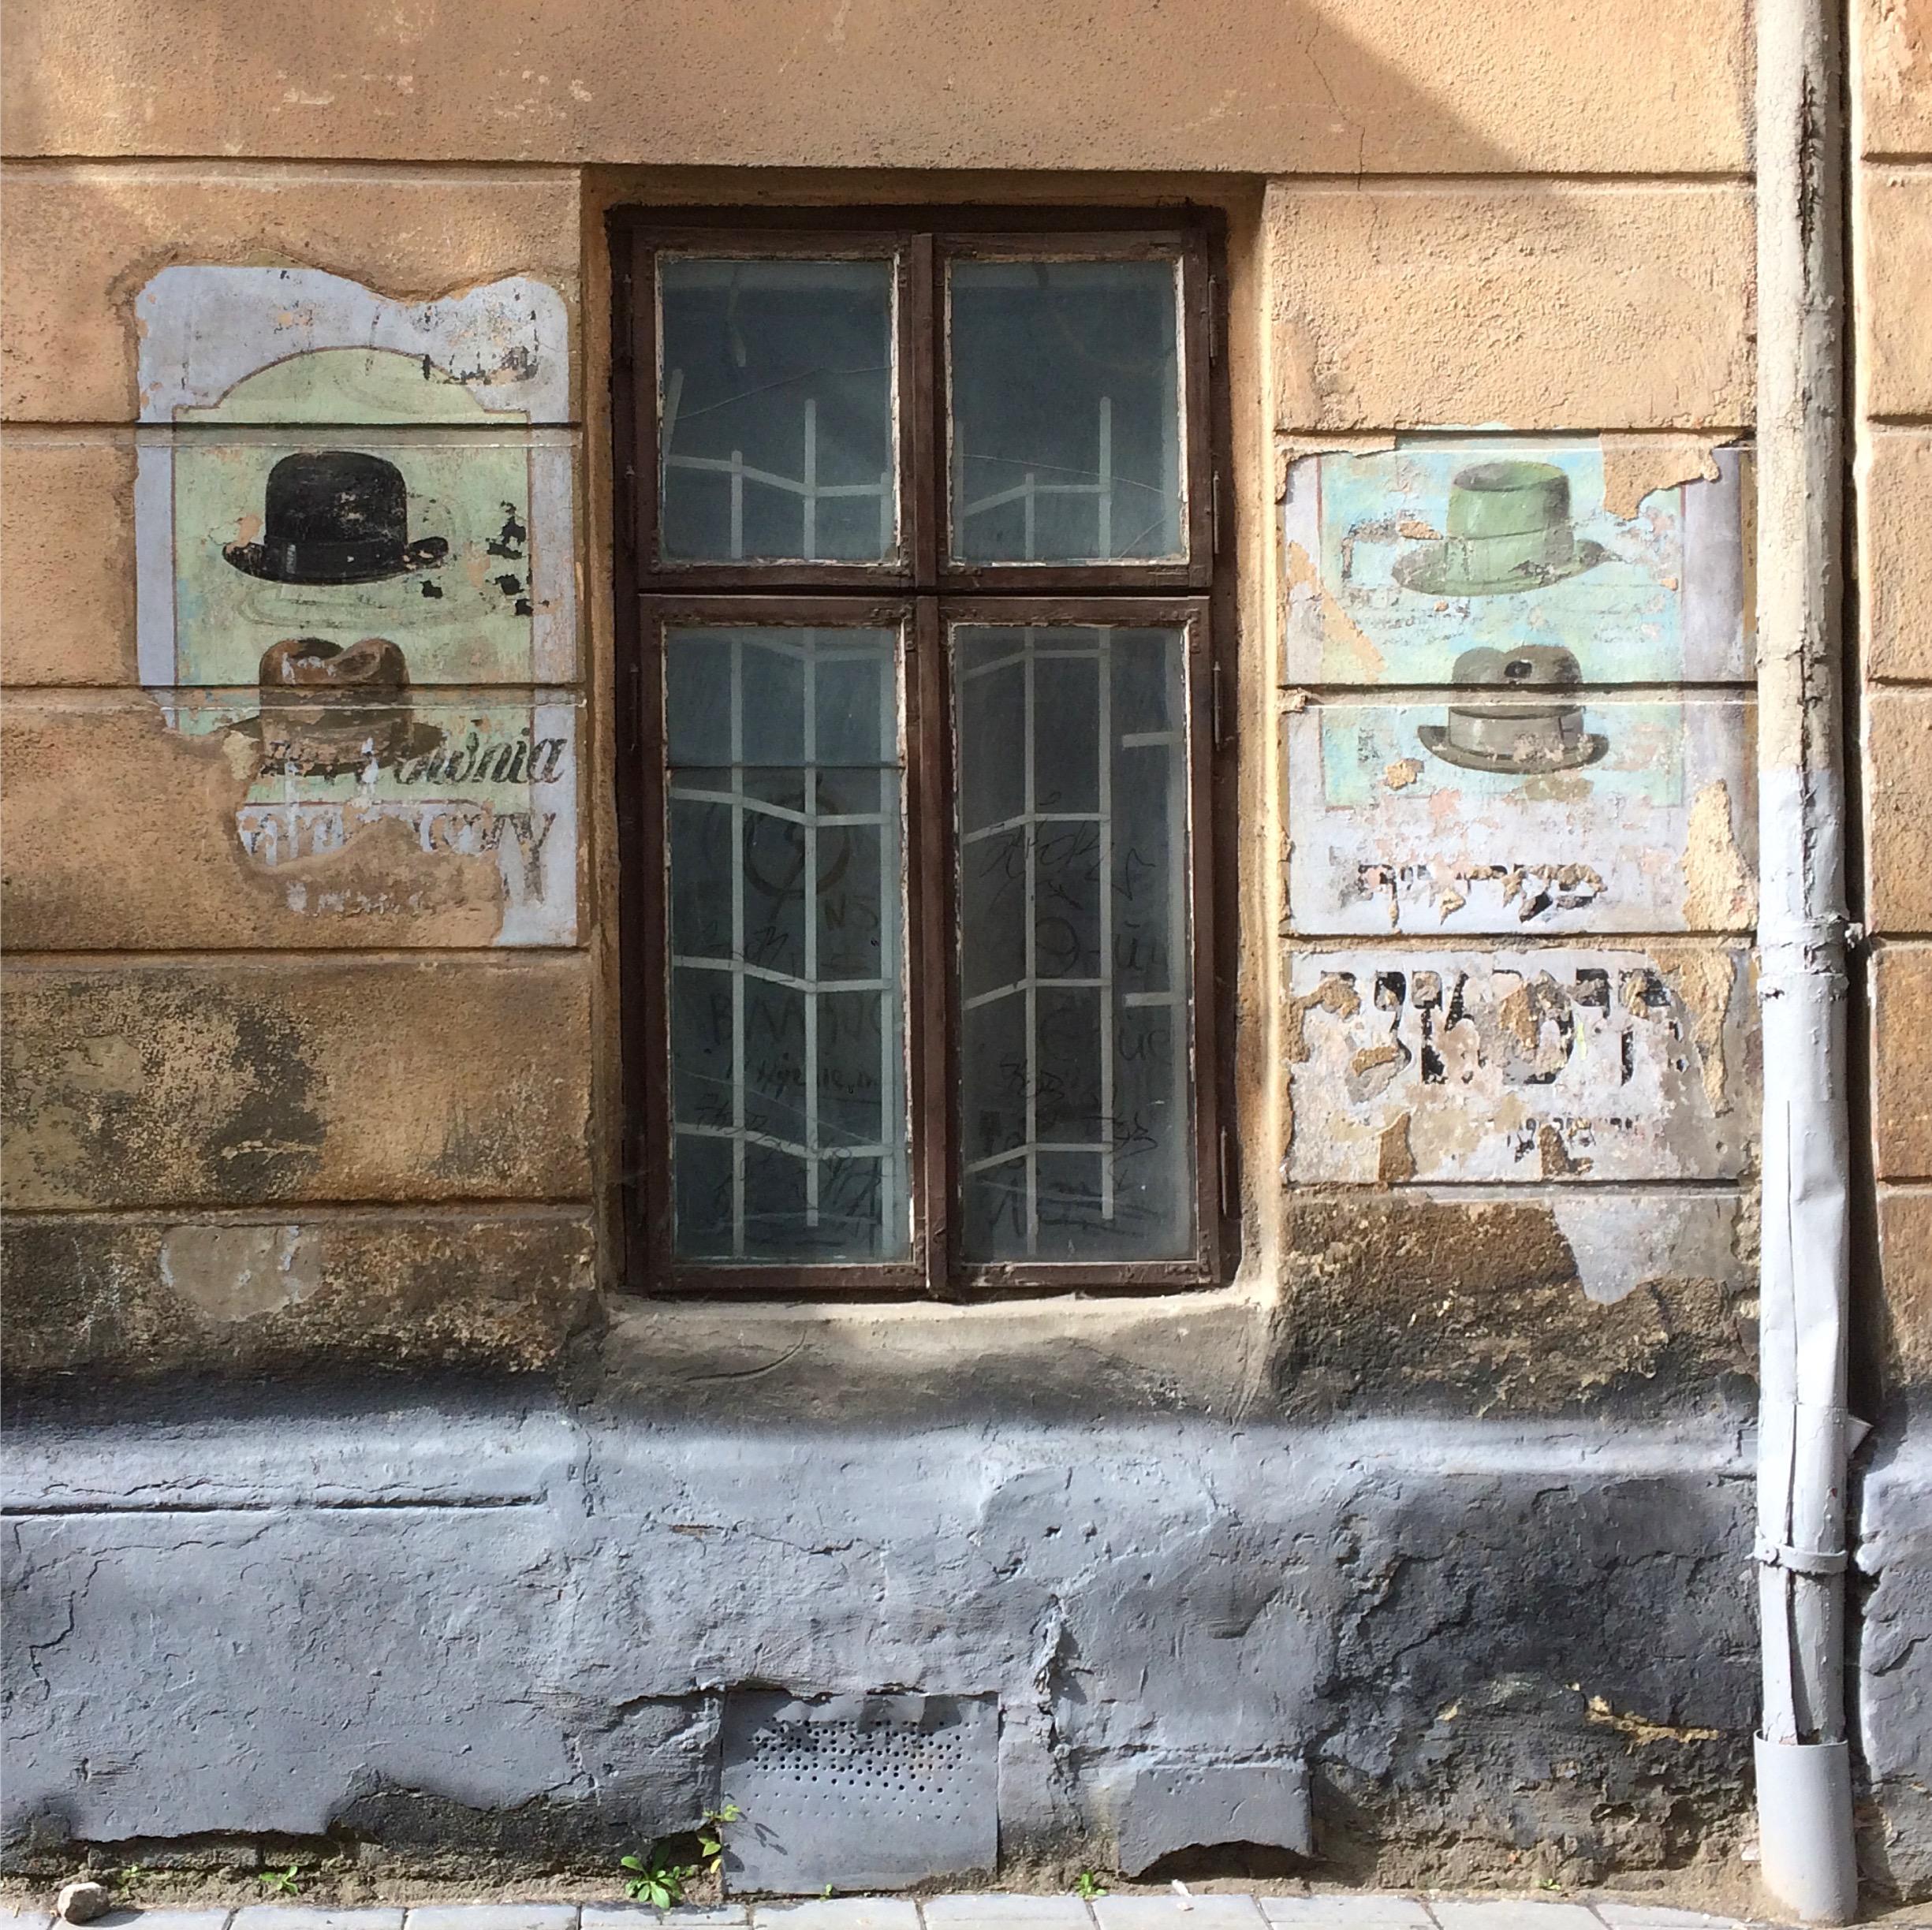 Lviv as Urban Palimpsest